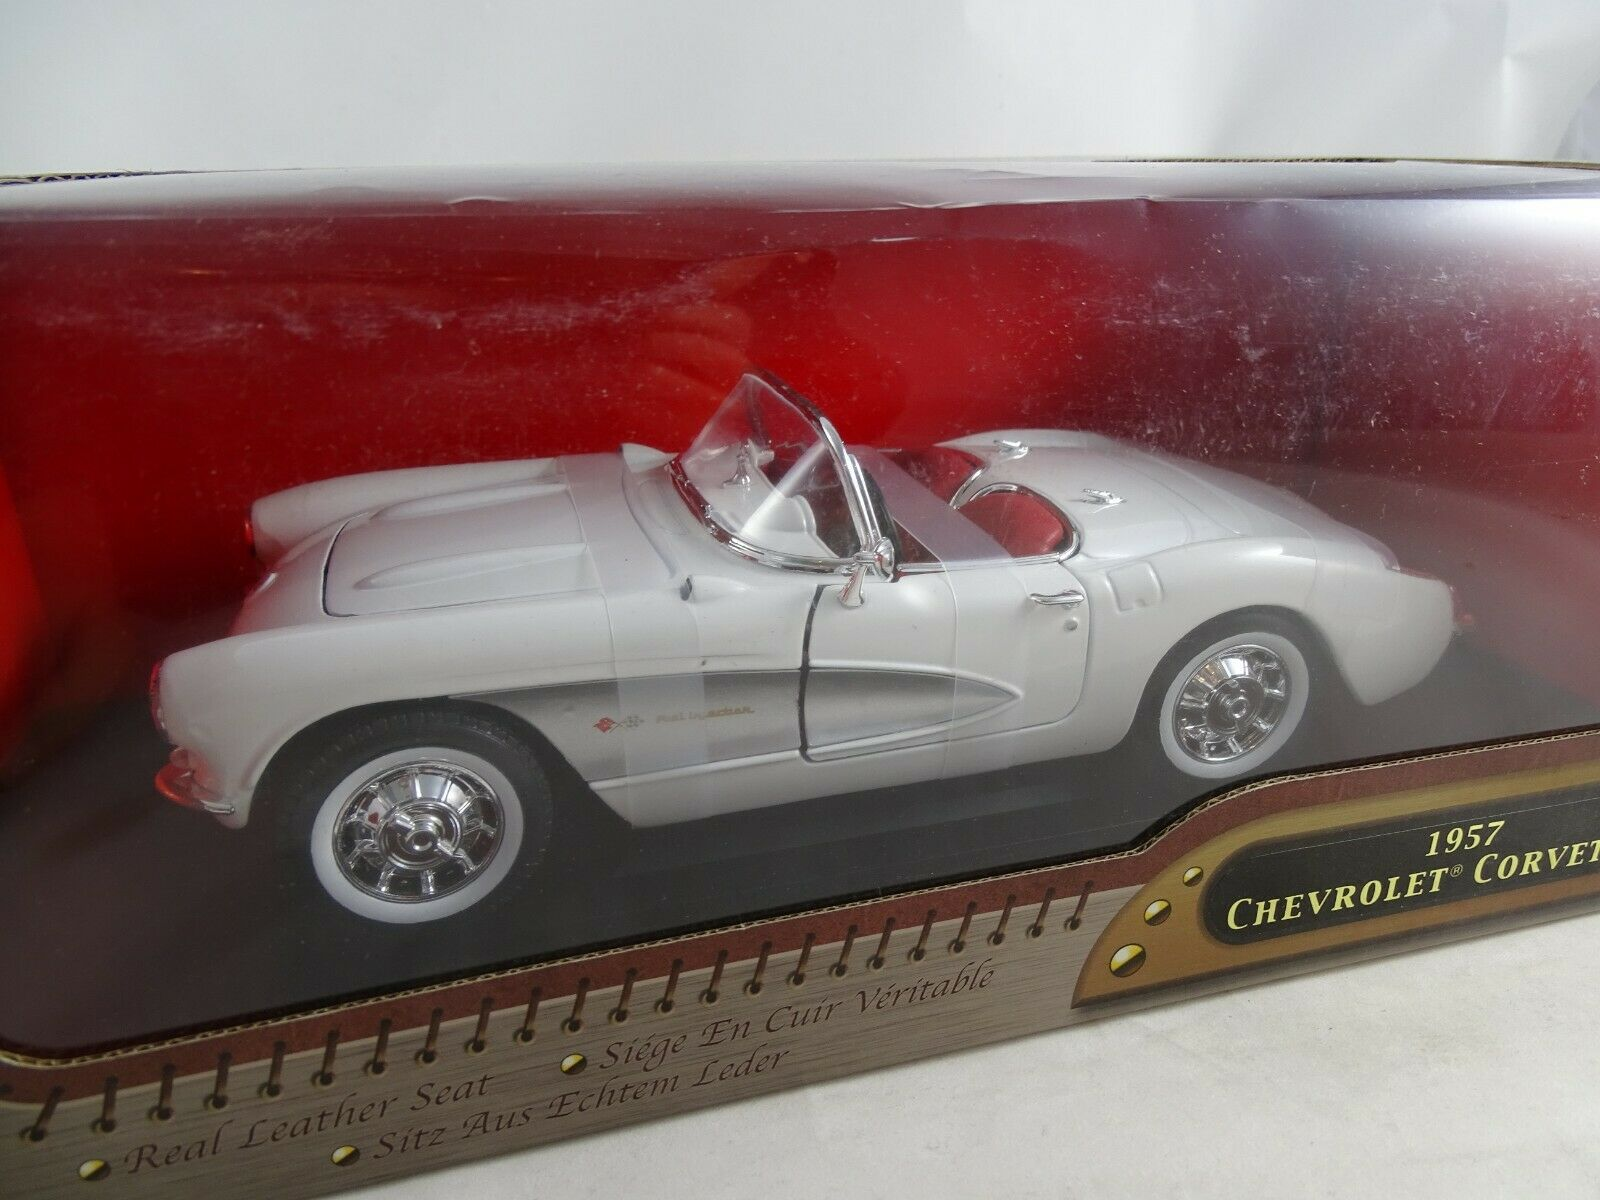 1 18 Vägsignatur Chevrolet Corvette mit echtem Leder RAR {65533;65533;